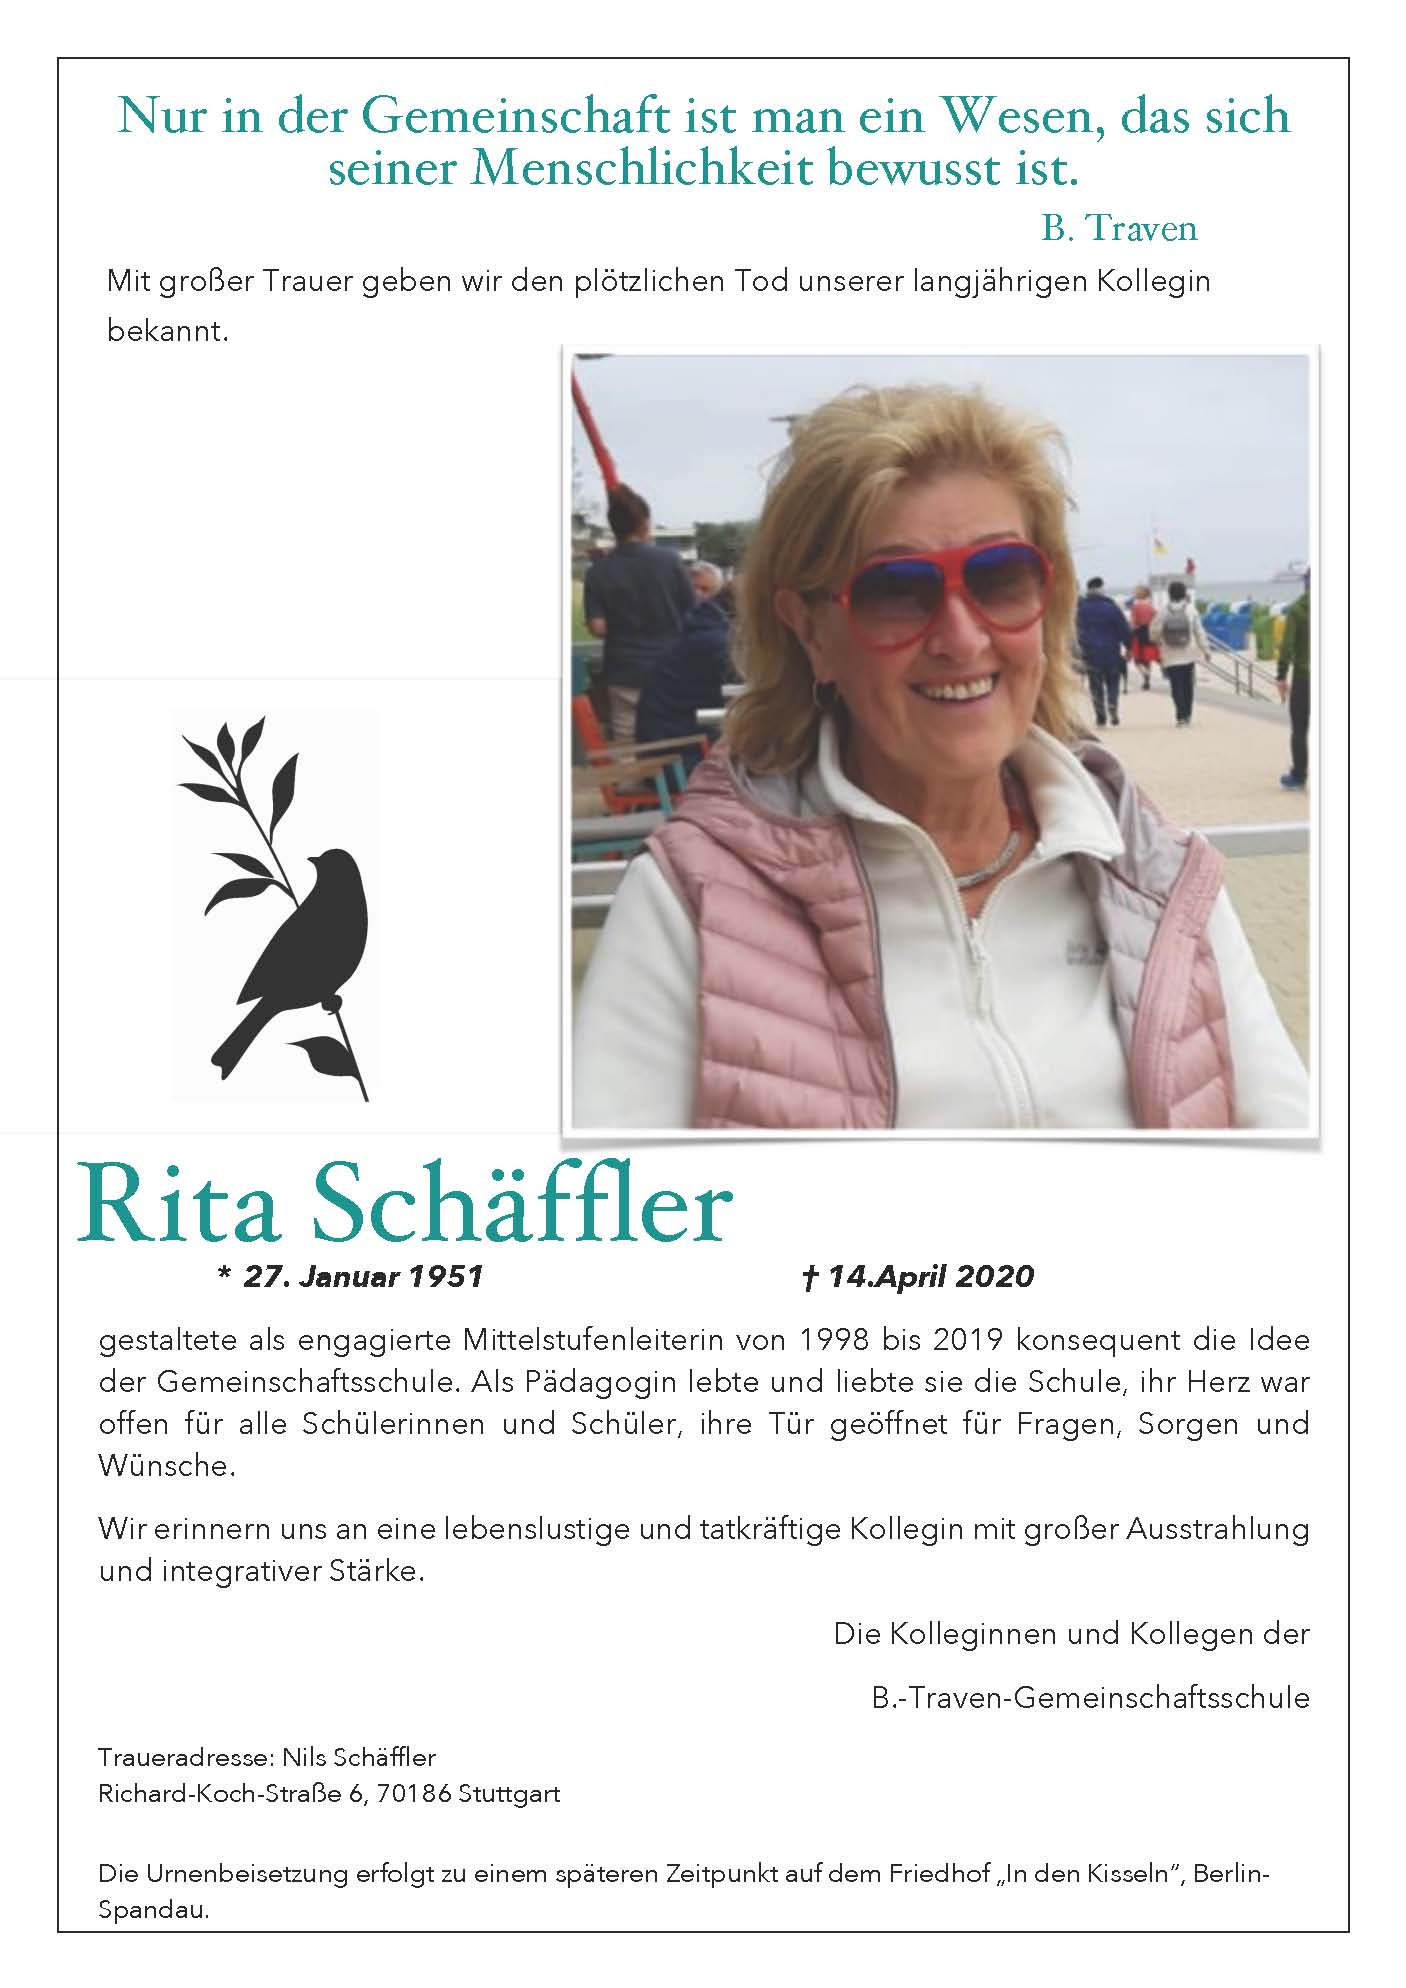 Rita Schäffler (1951 - 2020)